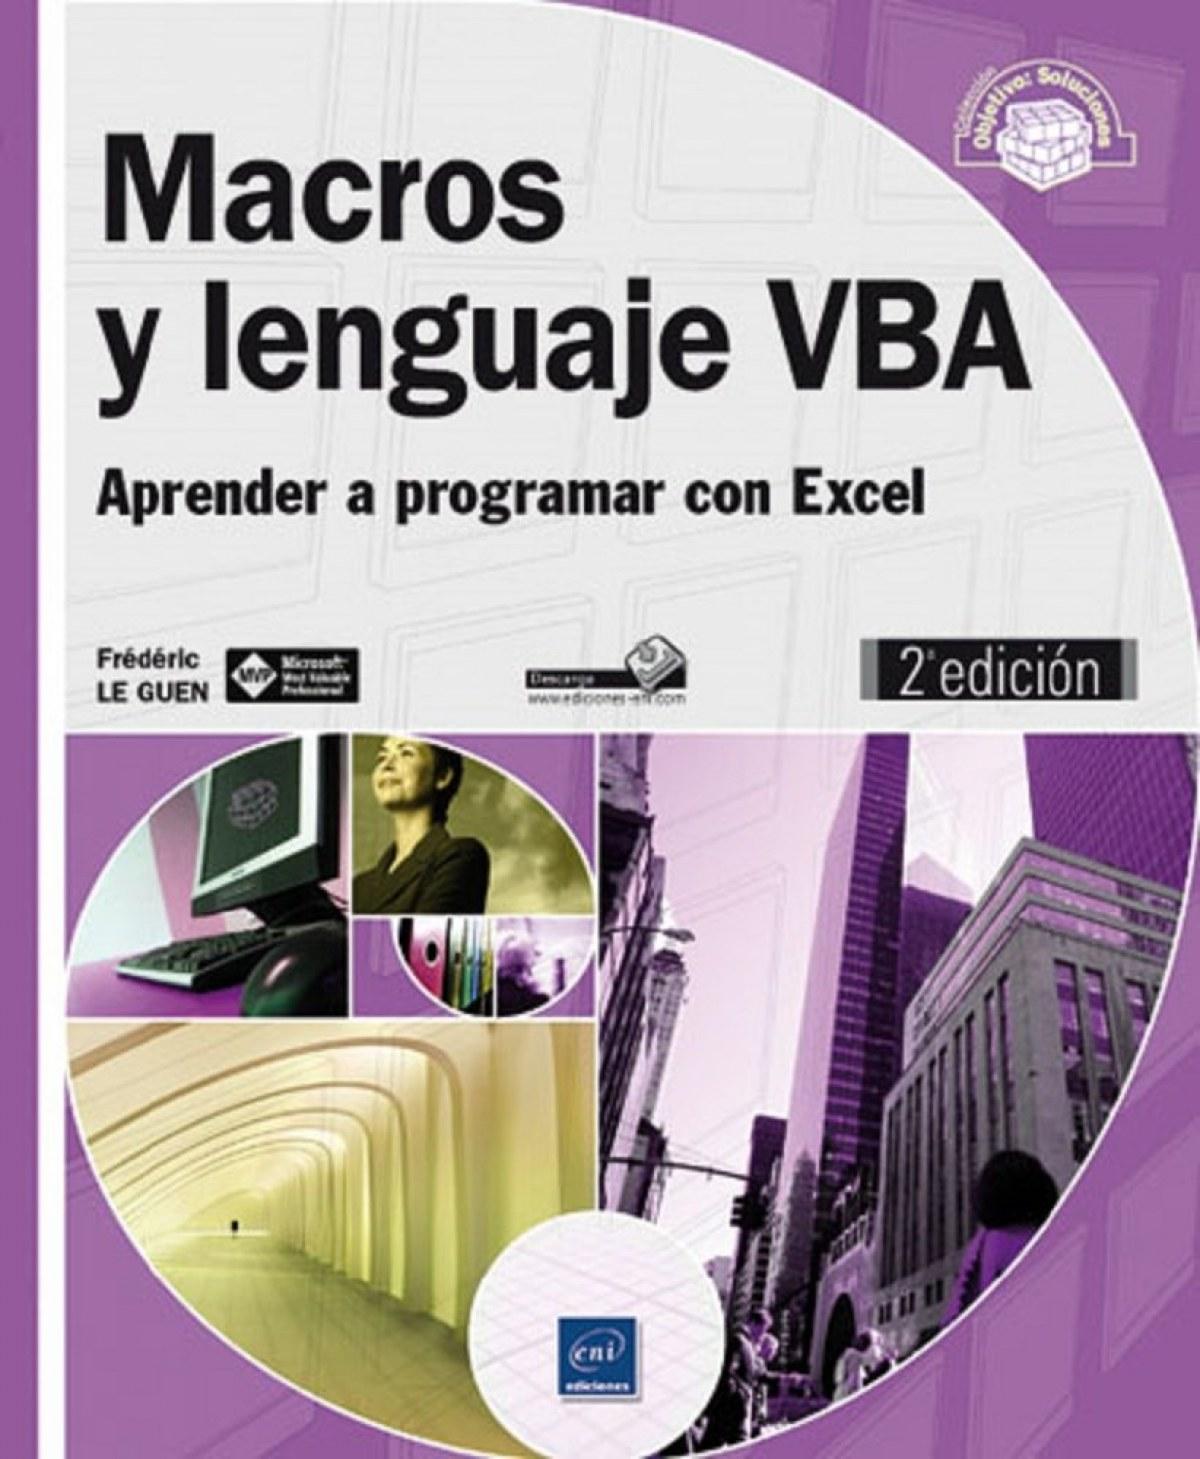 Objetivo: Soluciones Macros y lenguaje VBA (2ª ed.)